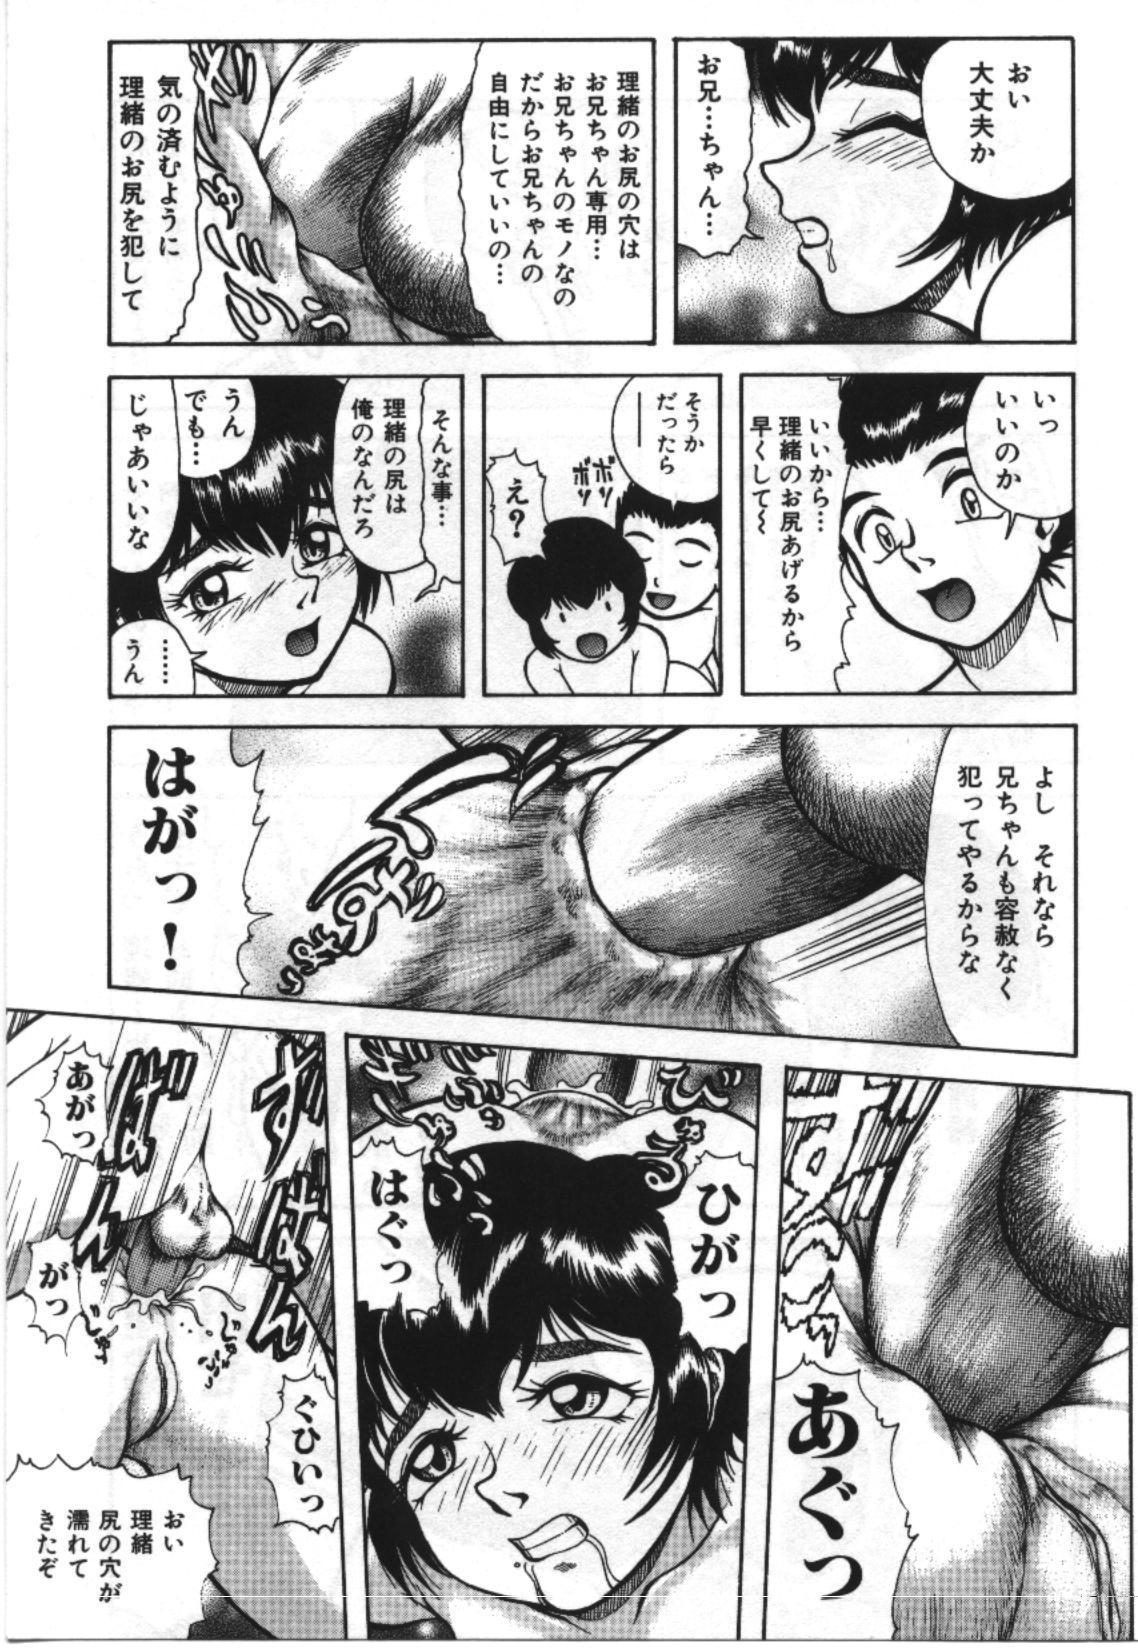 Imouto Koishi 2 46